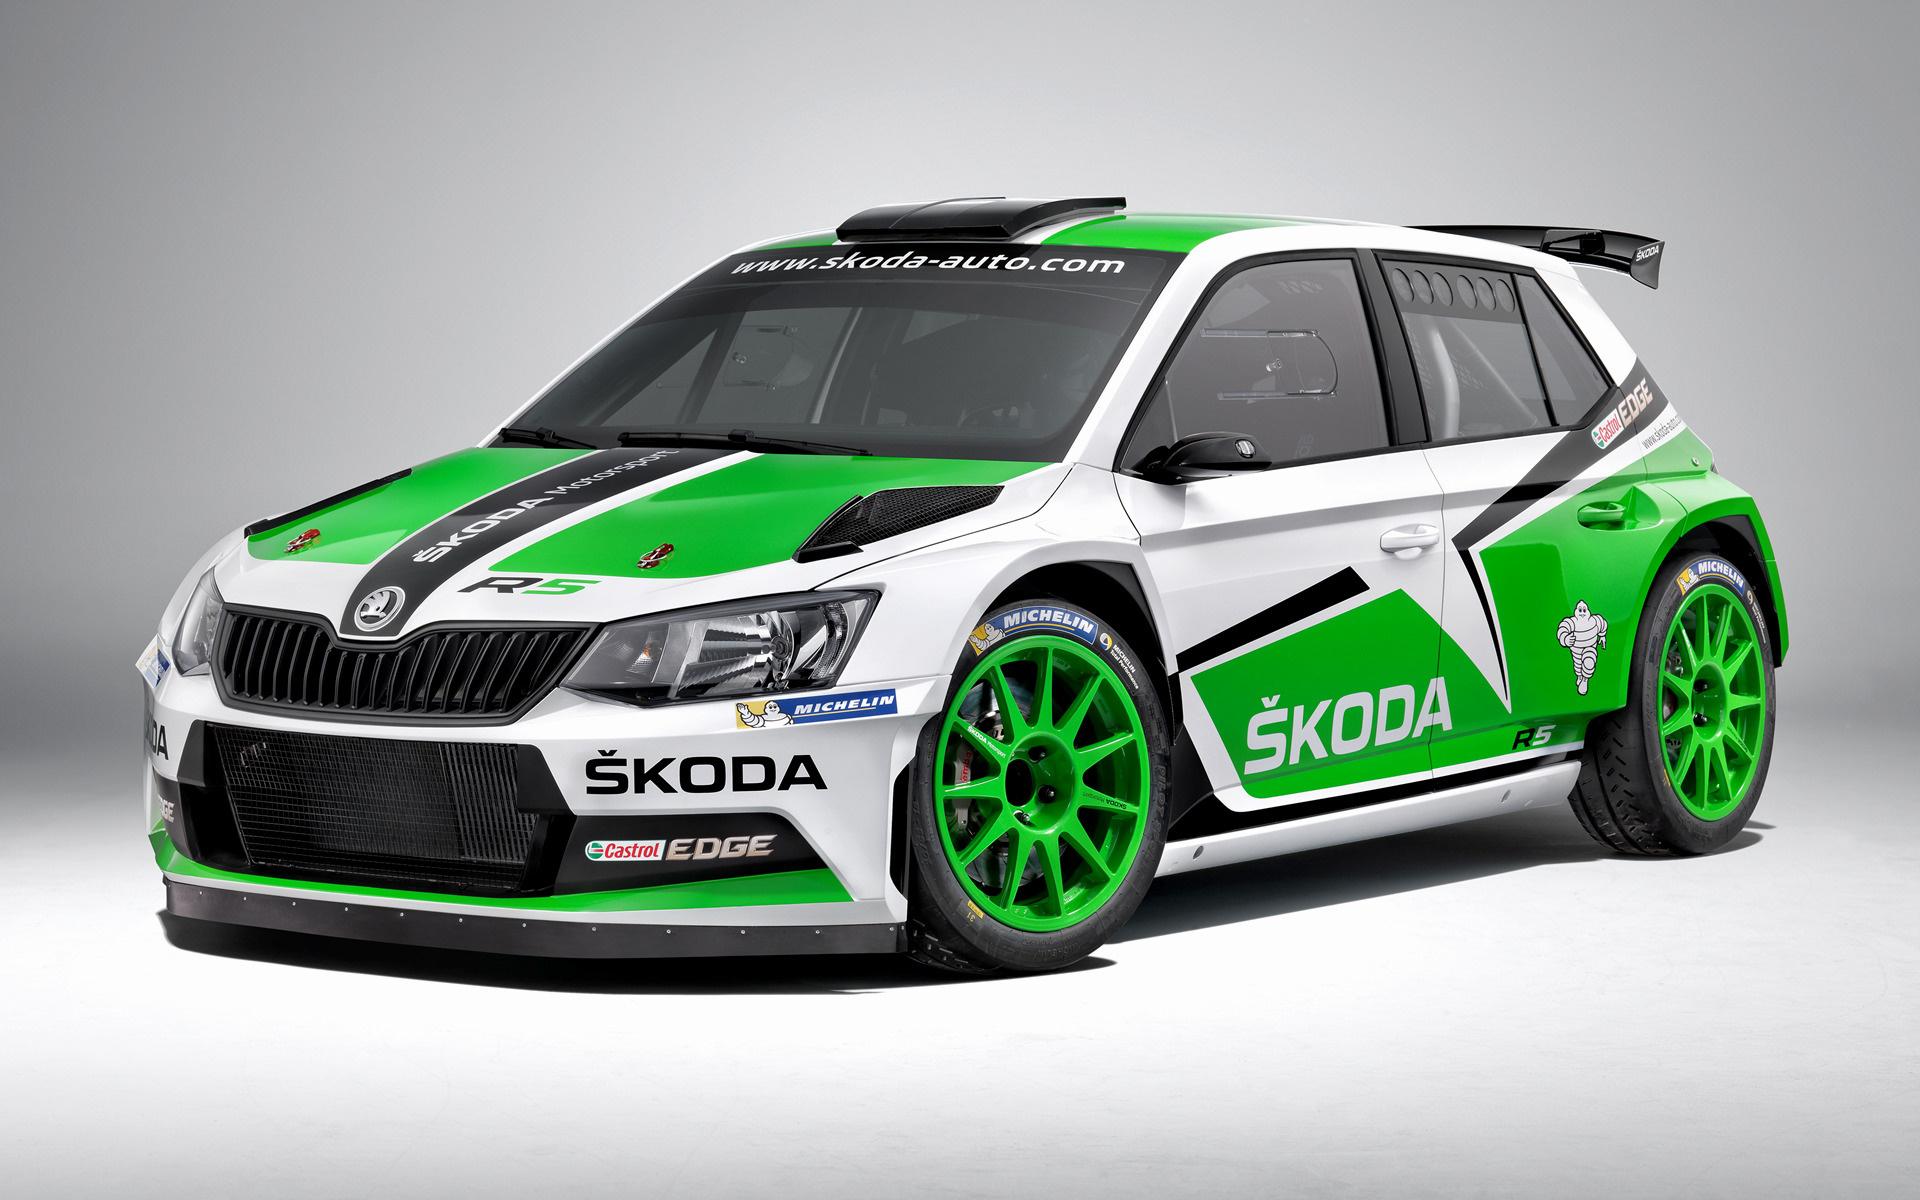 Skoda Fabia R5 2015 Wallpapers And Hd Images Car Pixel